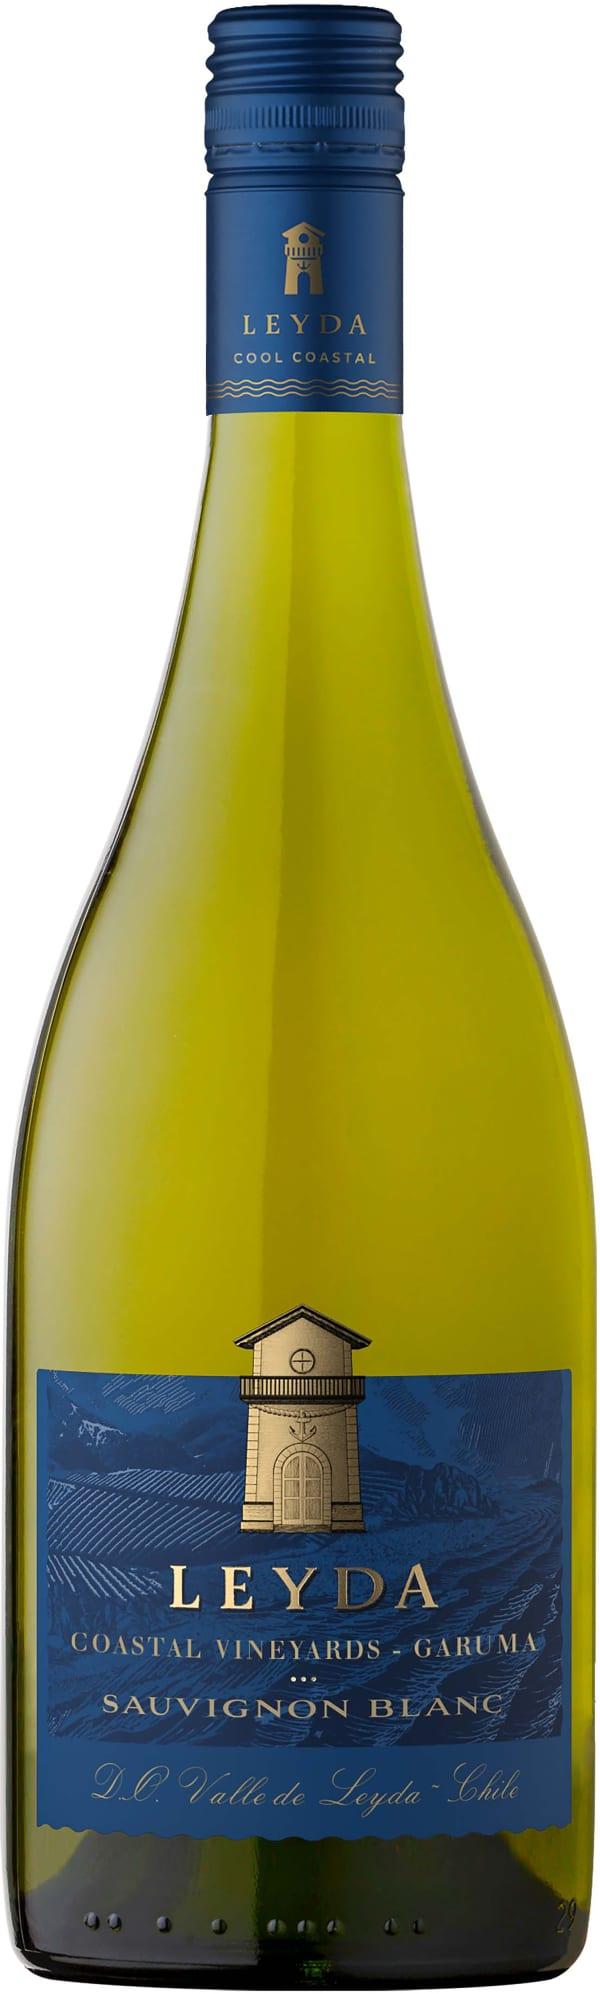 Leyda Garuma Vineyard Sauvignon Blanc 2015